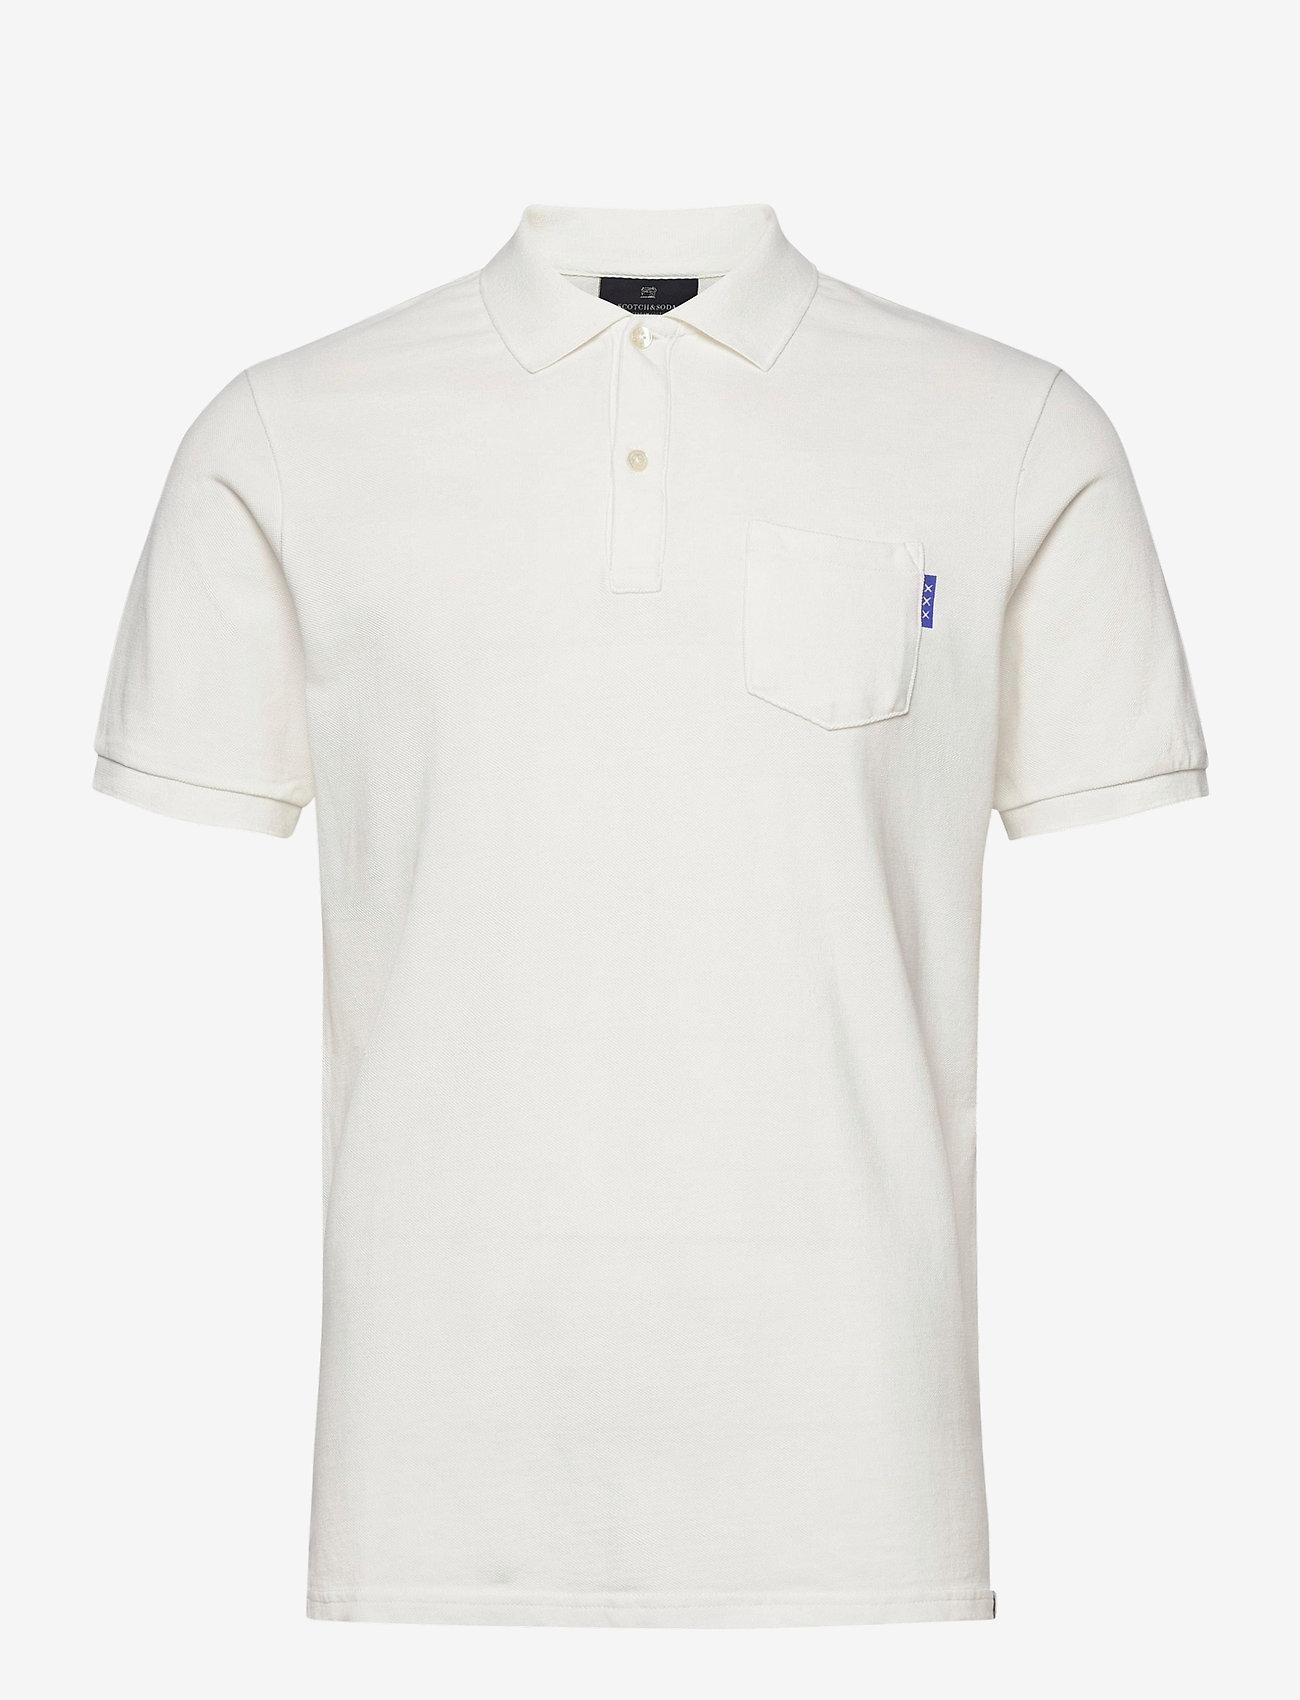 Scotch & Soda - Garment dye polo - short-sleeved polos - off white - 0